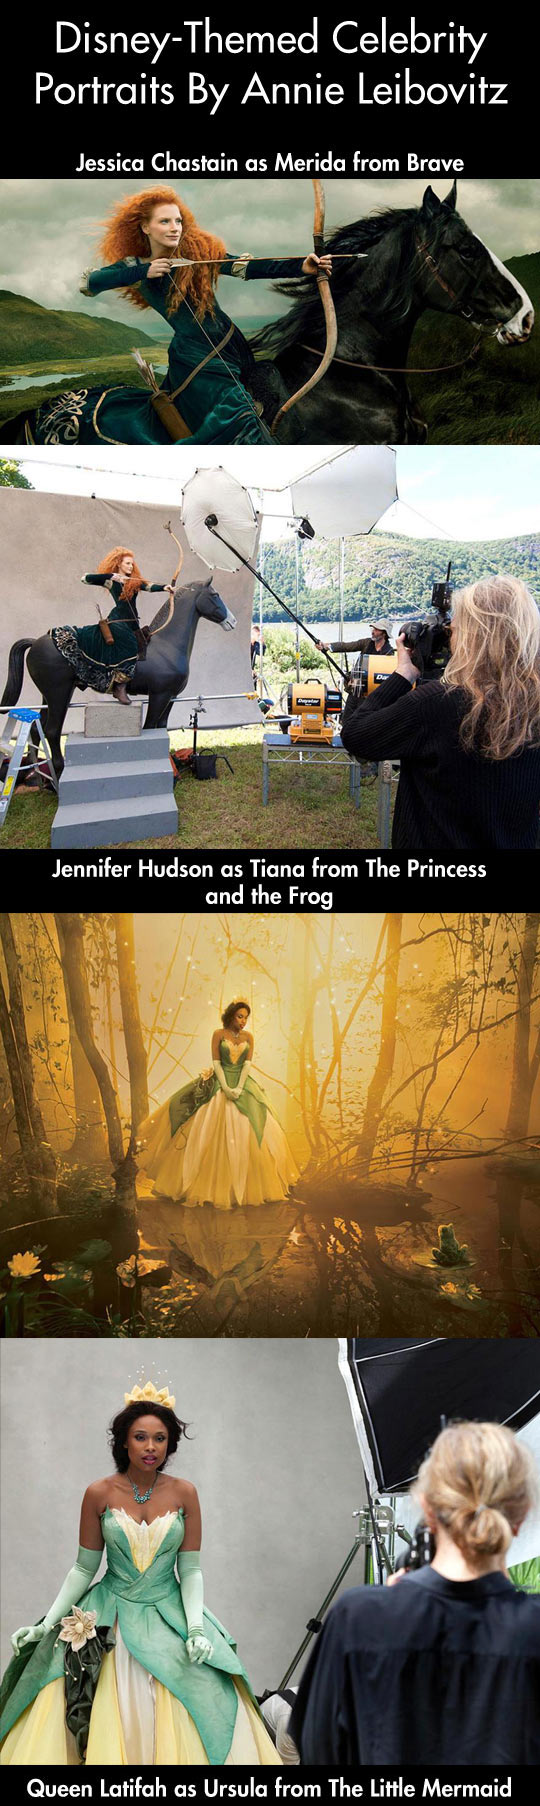 funny-Disney-dream-photo-manipulation-movies